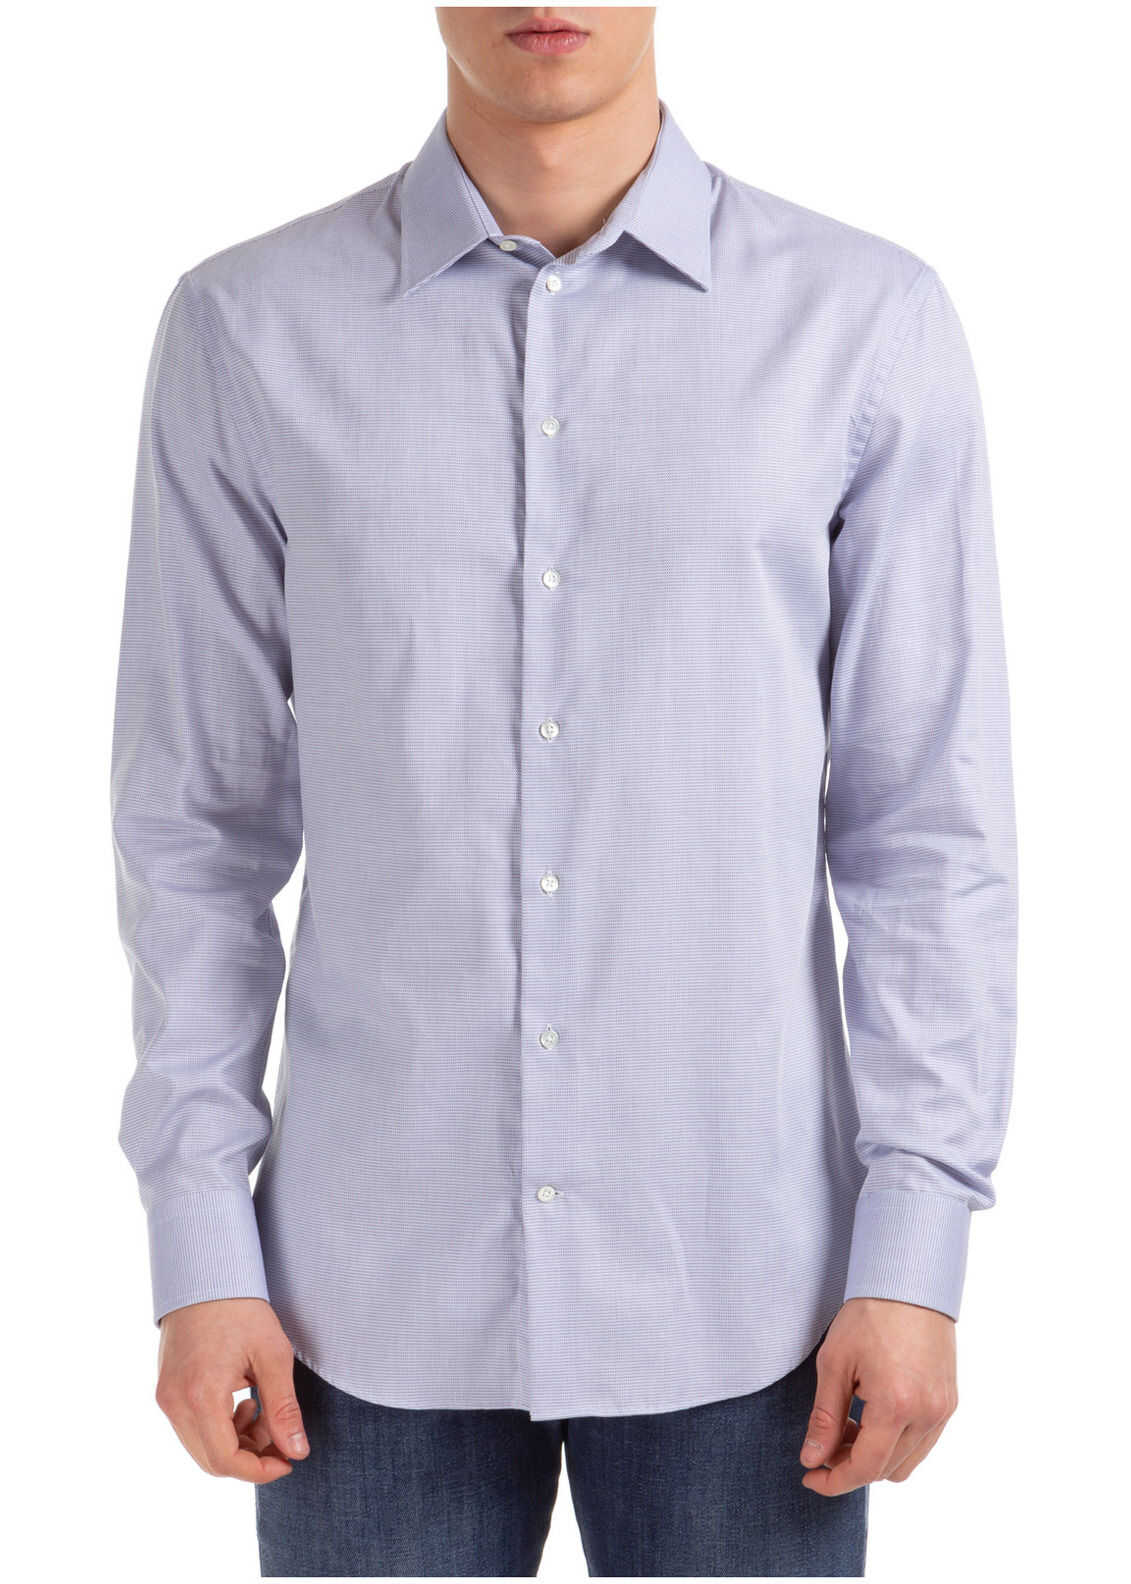 Emporio Armani Dress Shirt Purple imagine